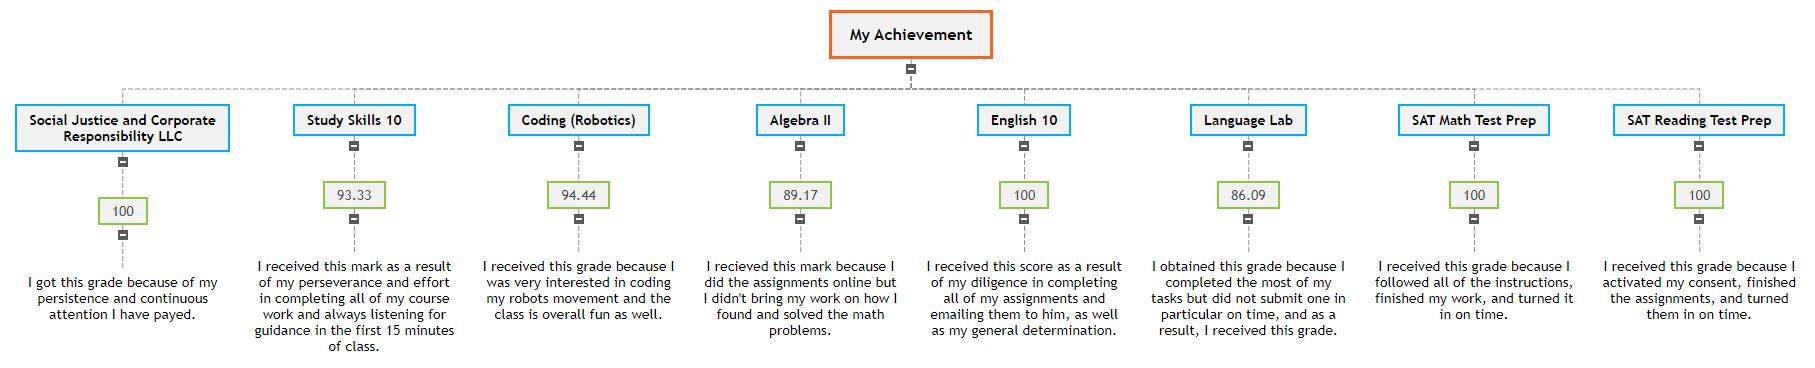 My Achievements (Project) Mind Map